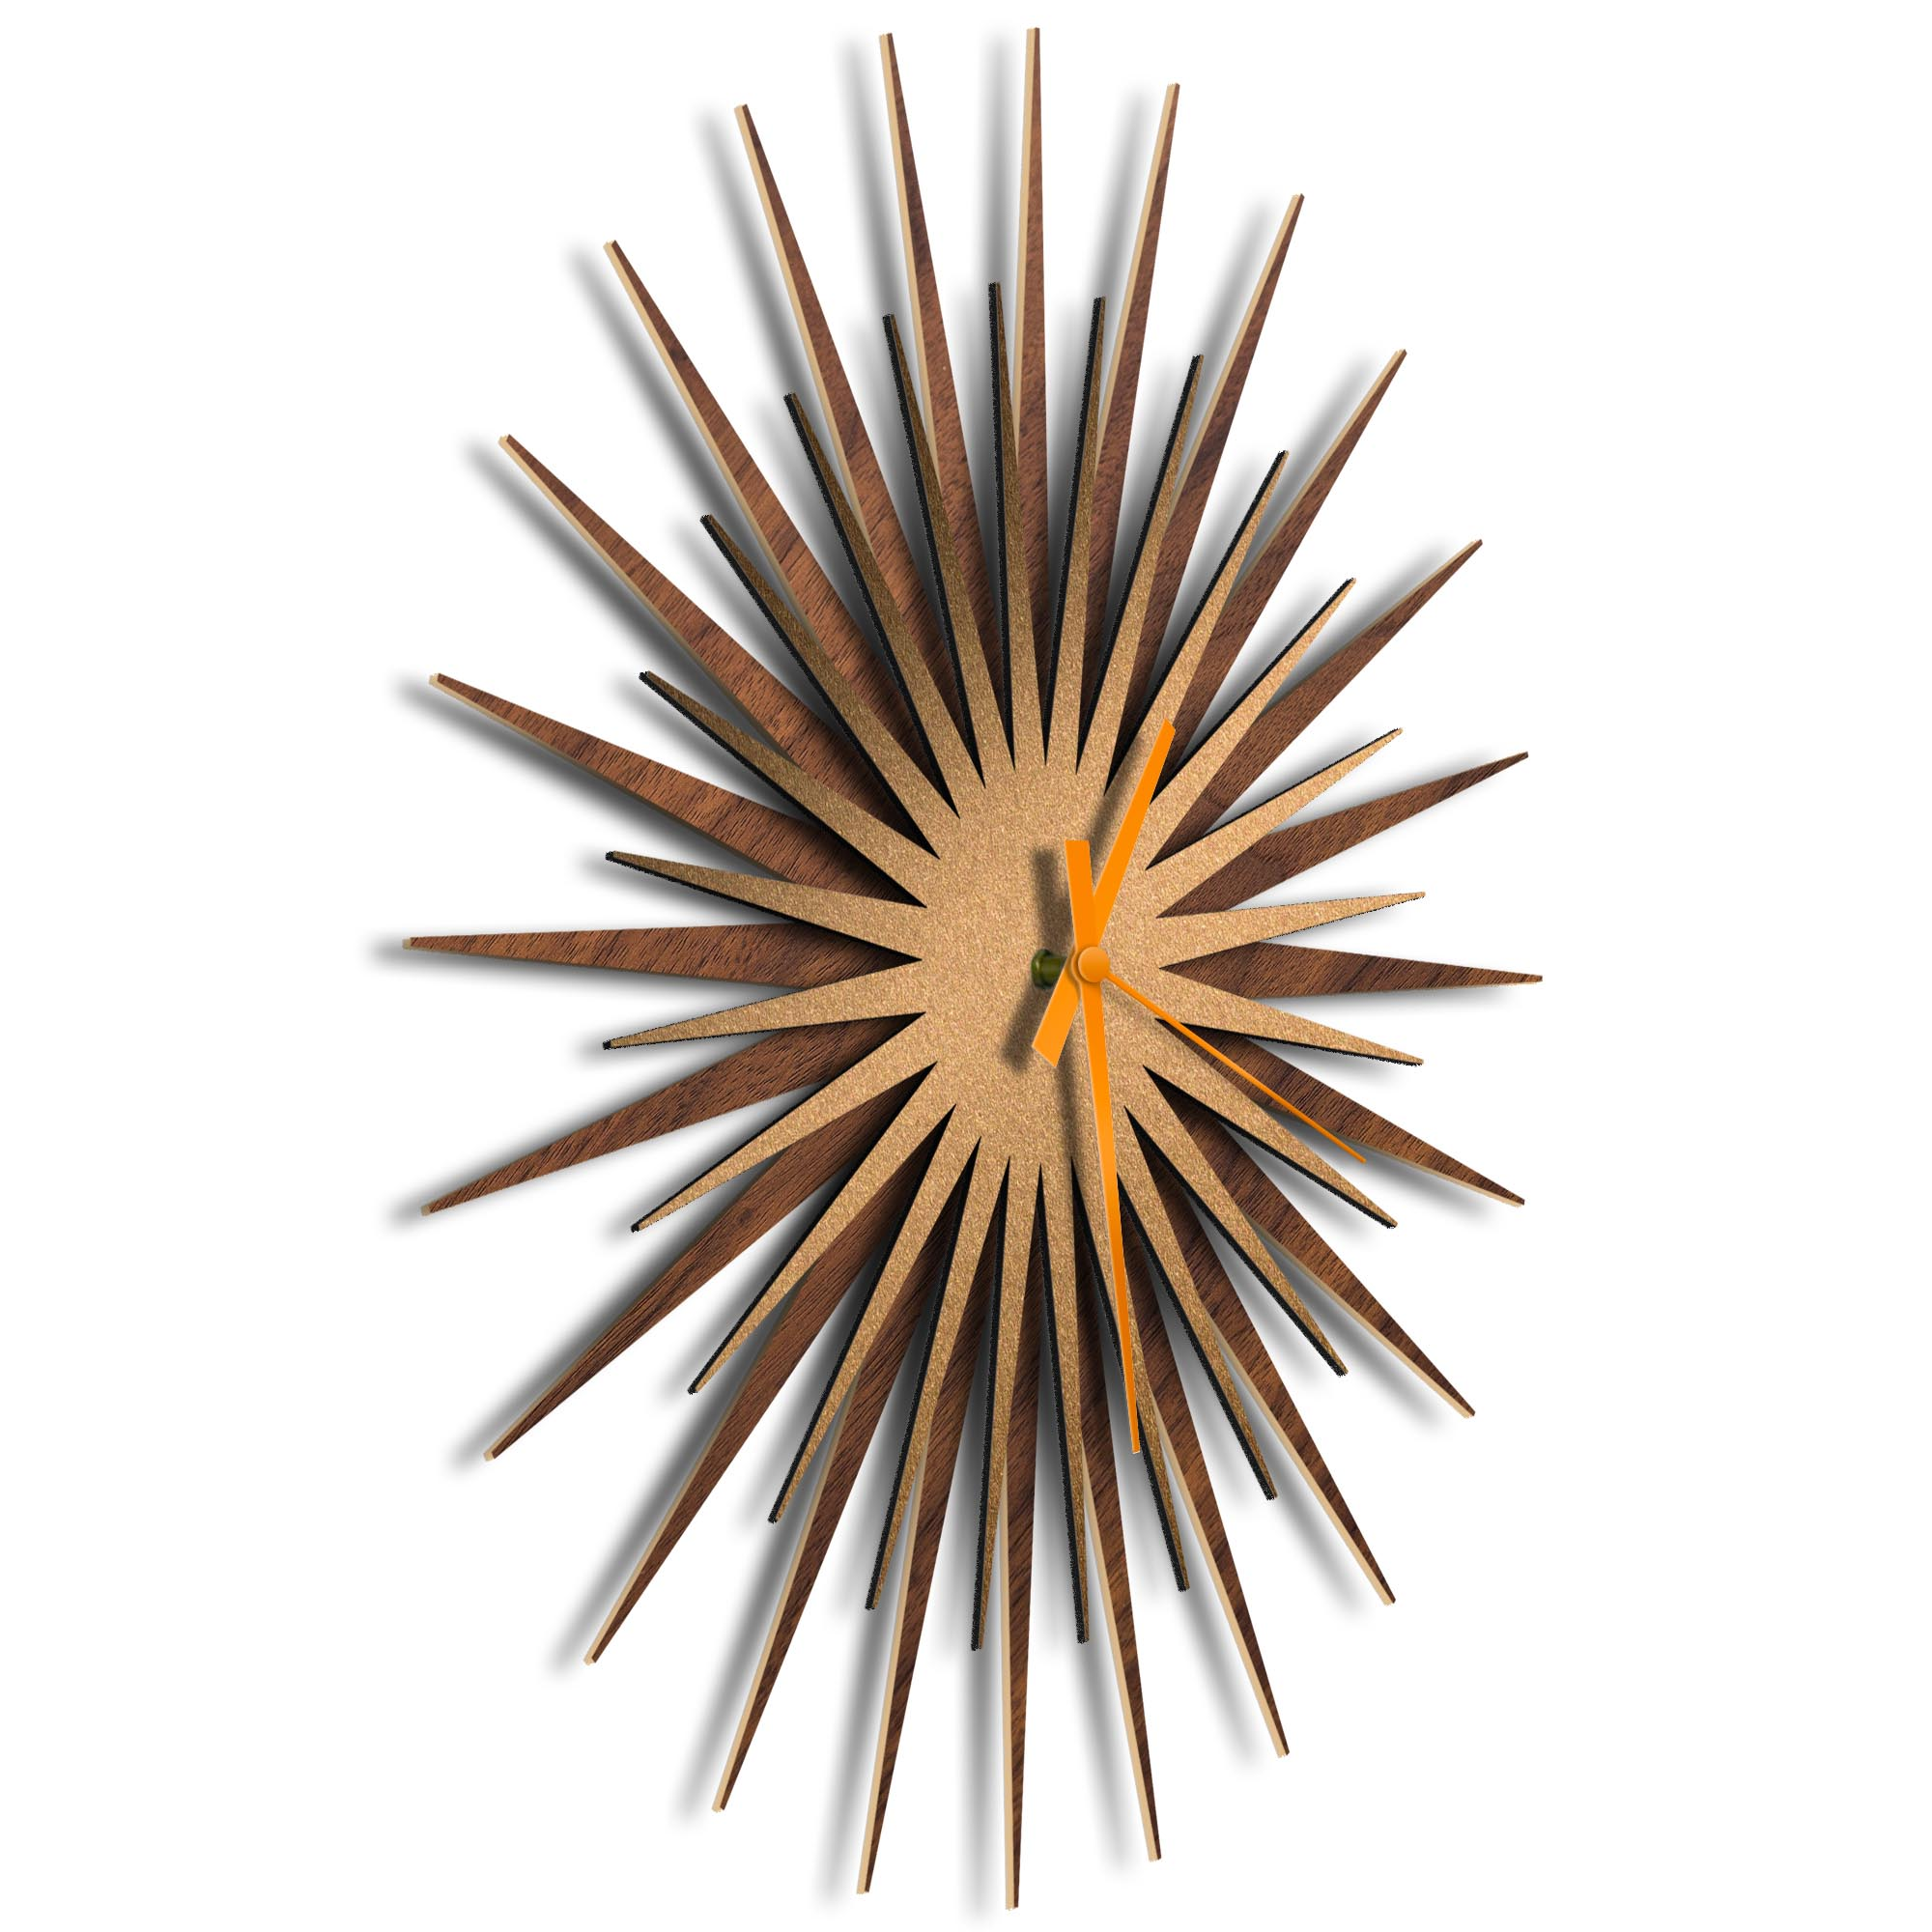 Atomic Era Clock Walnut Bronze Orange by Adam Schwoeppe - Mid-Century Modern Clock on Brushed Walnut Polymetal - Image 2